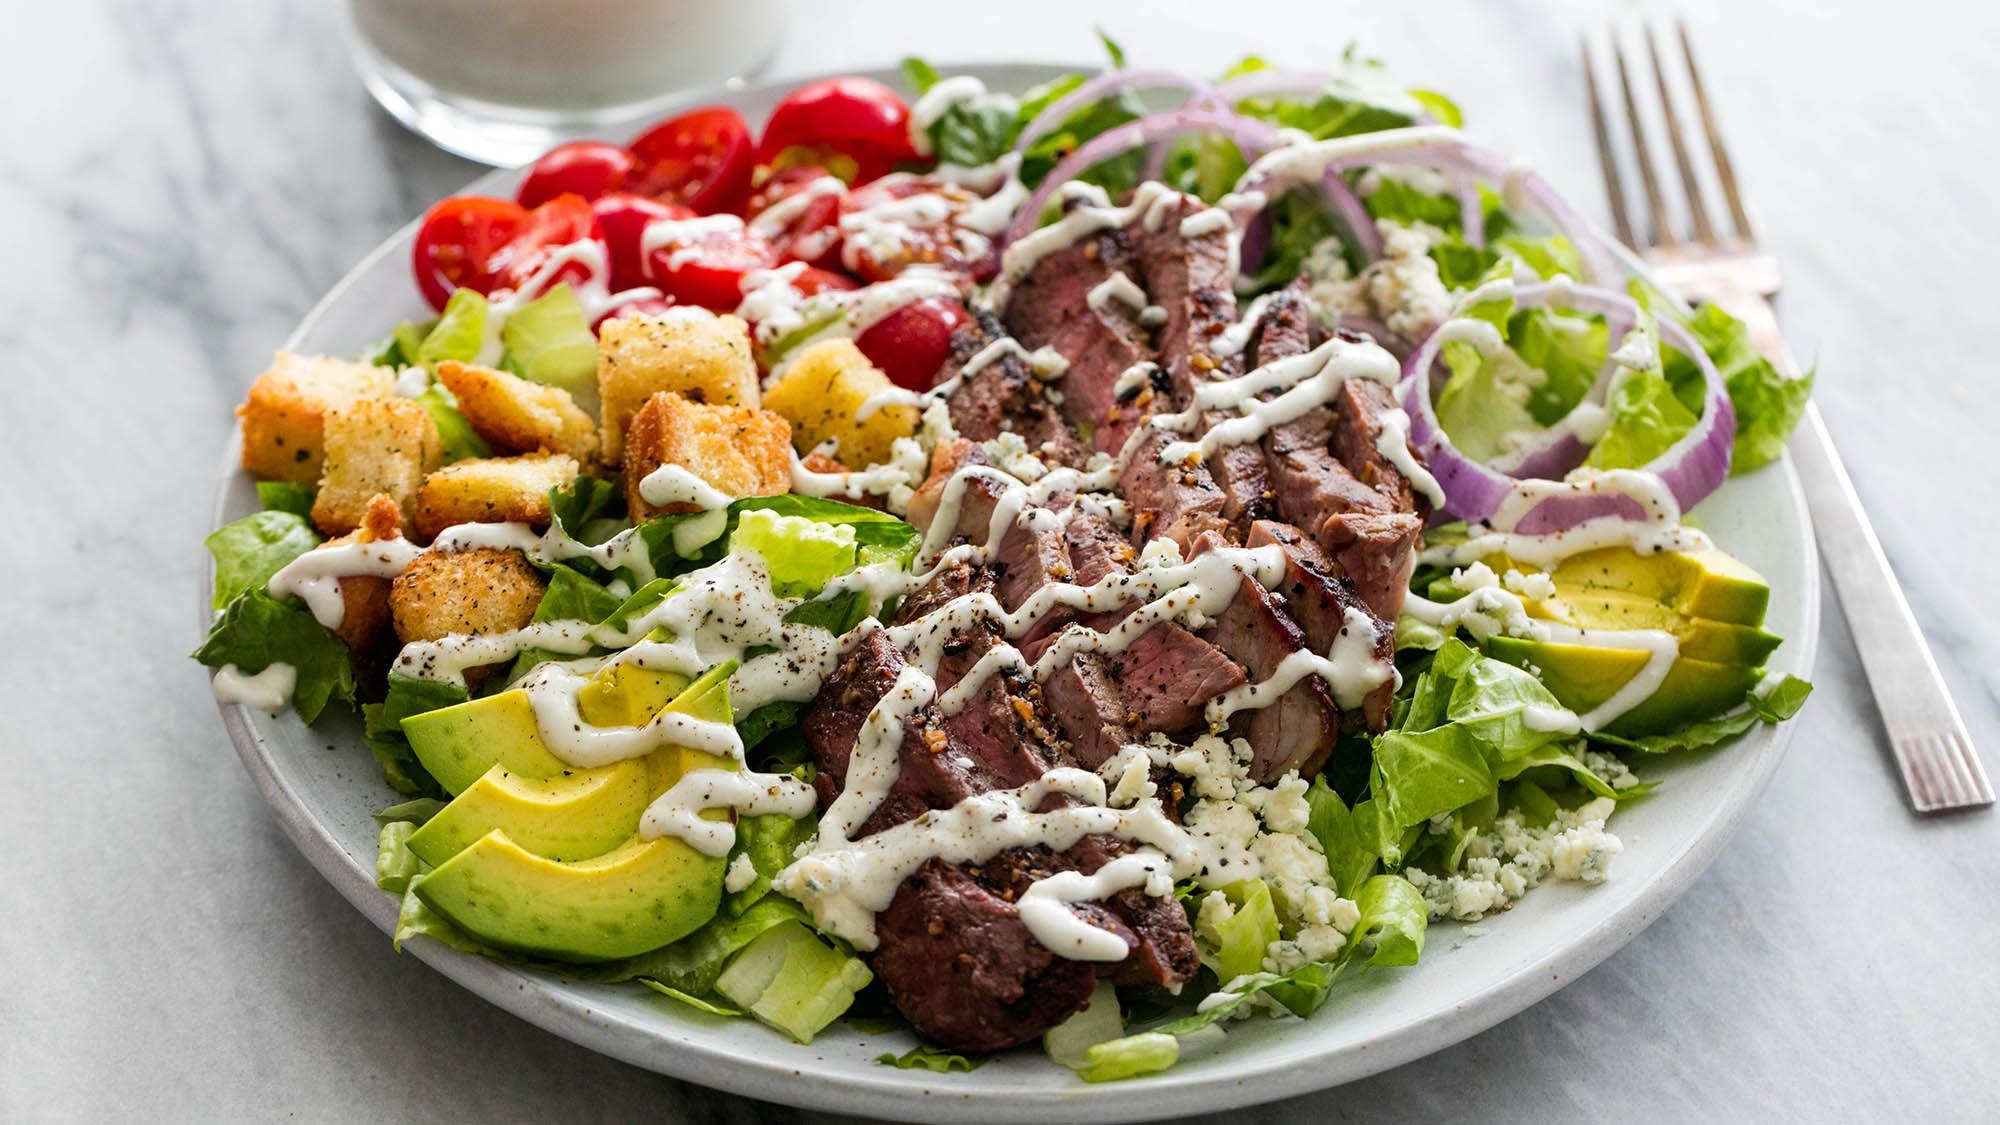 Steak salad with avocado